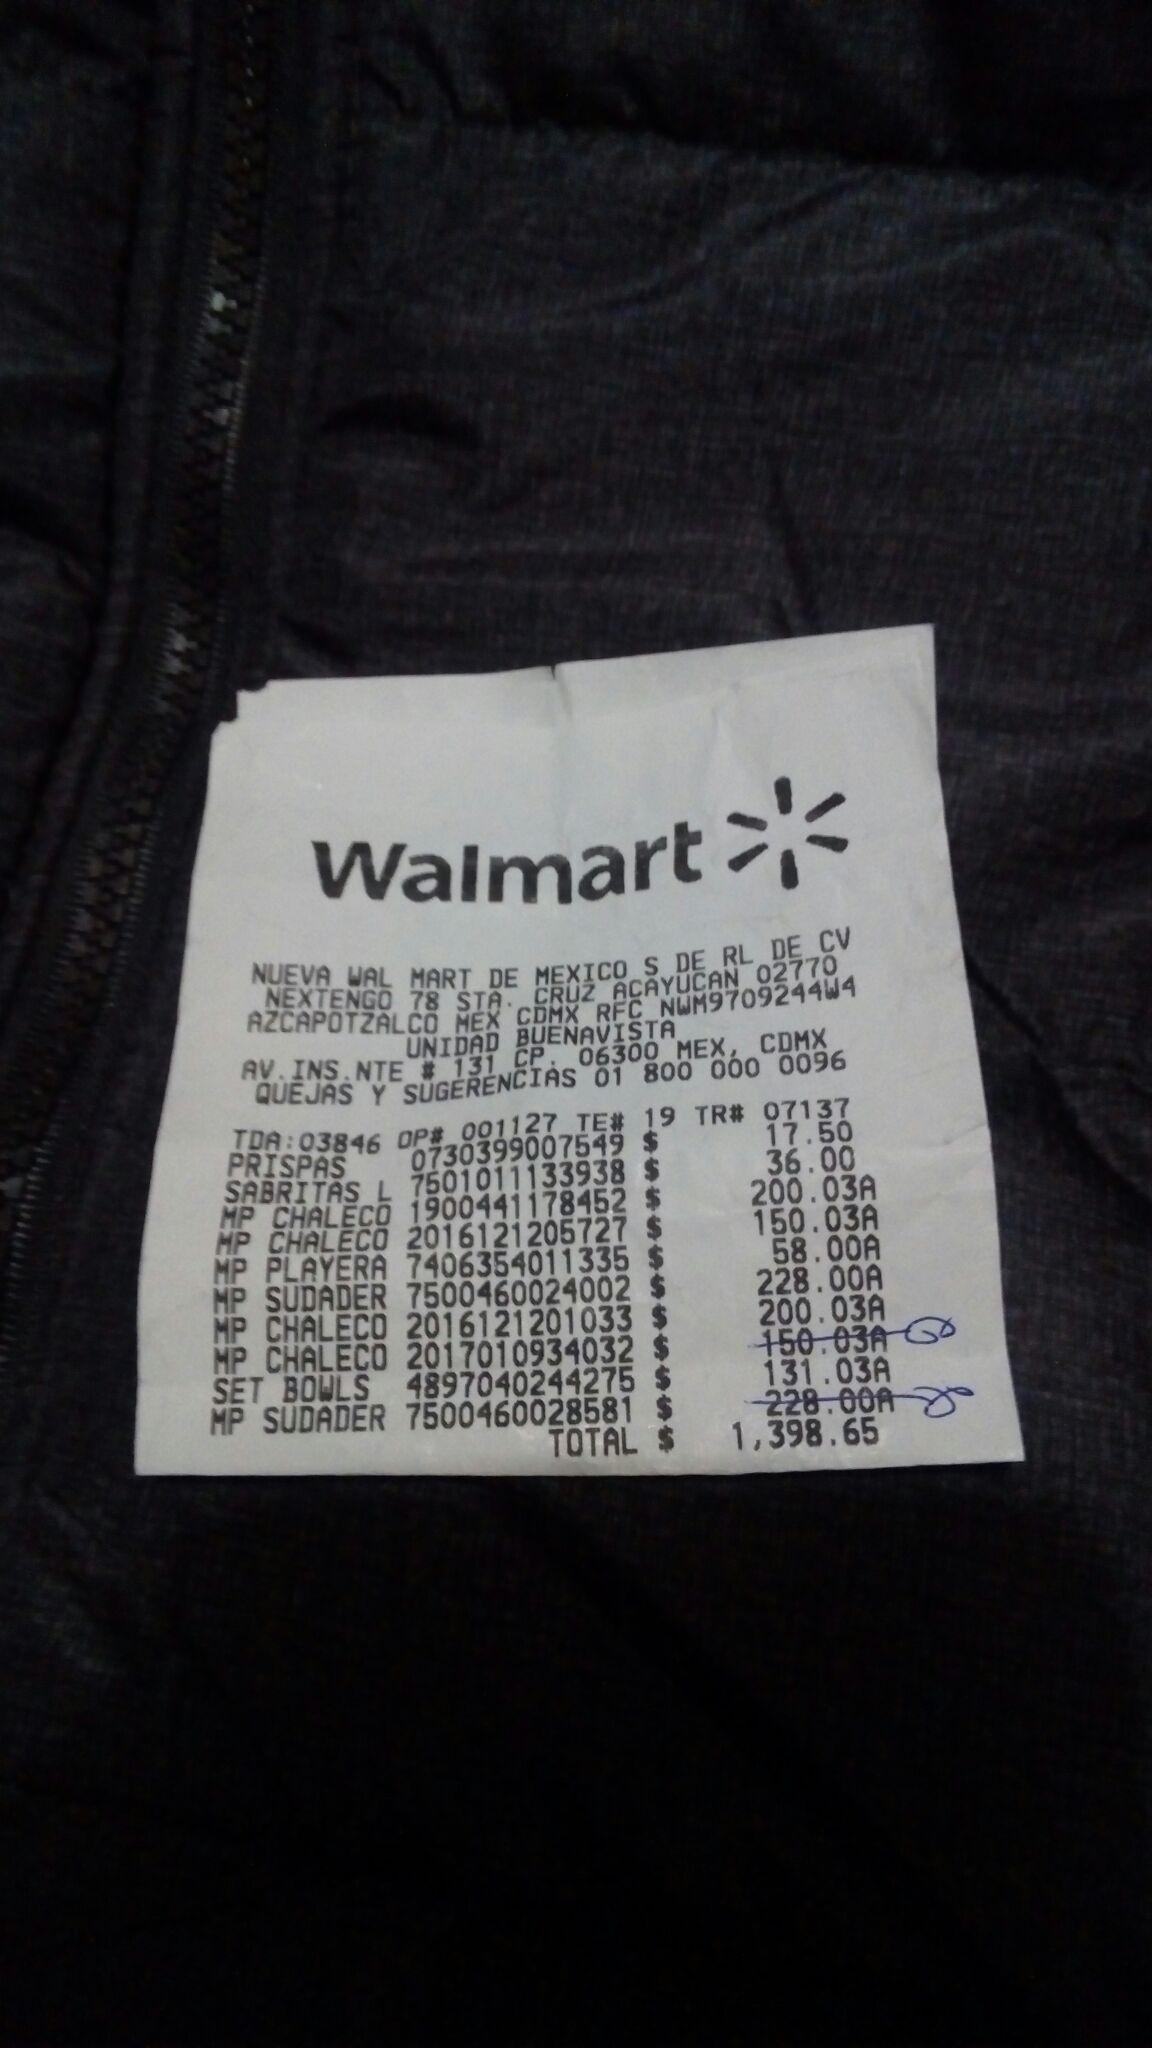 Walmart Buenavista Cdmx: Chalecos 725 a $200.03